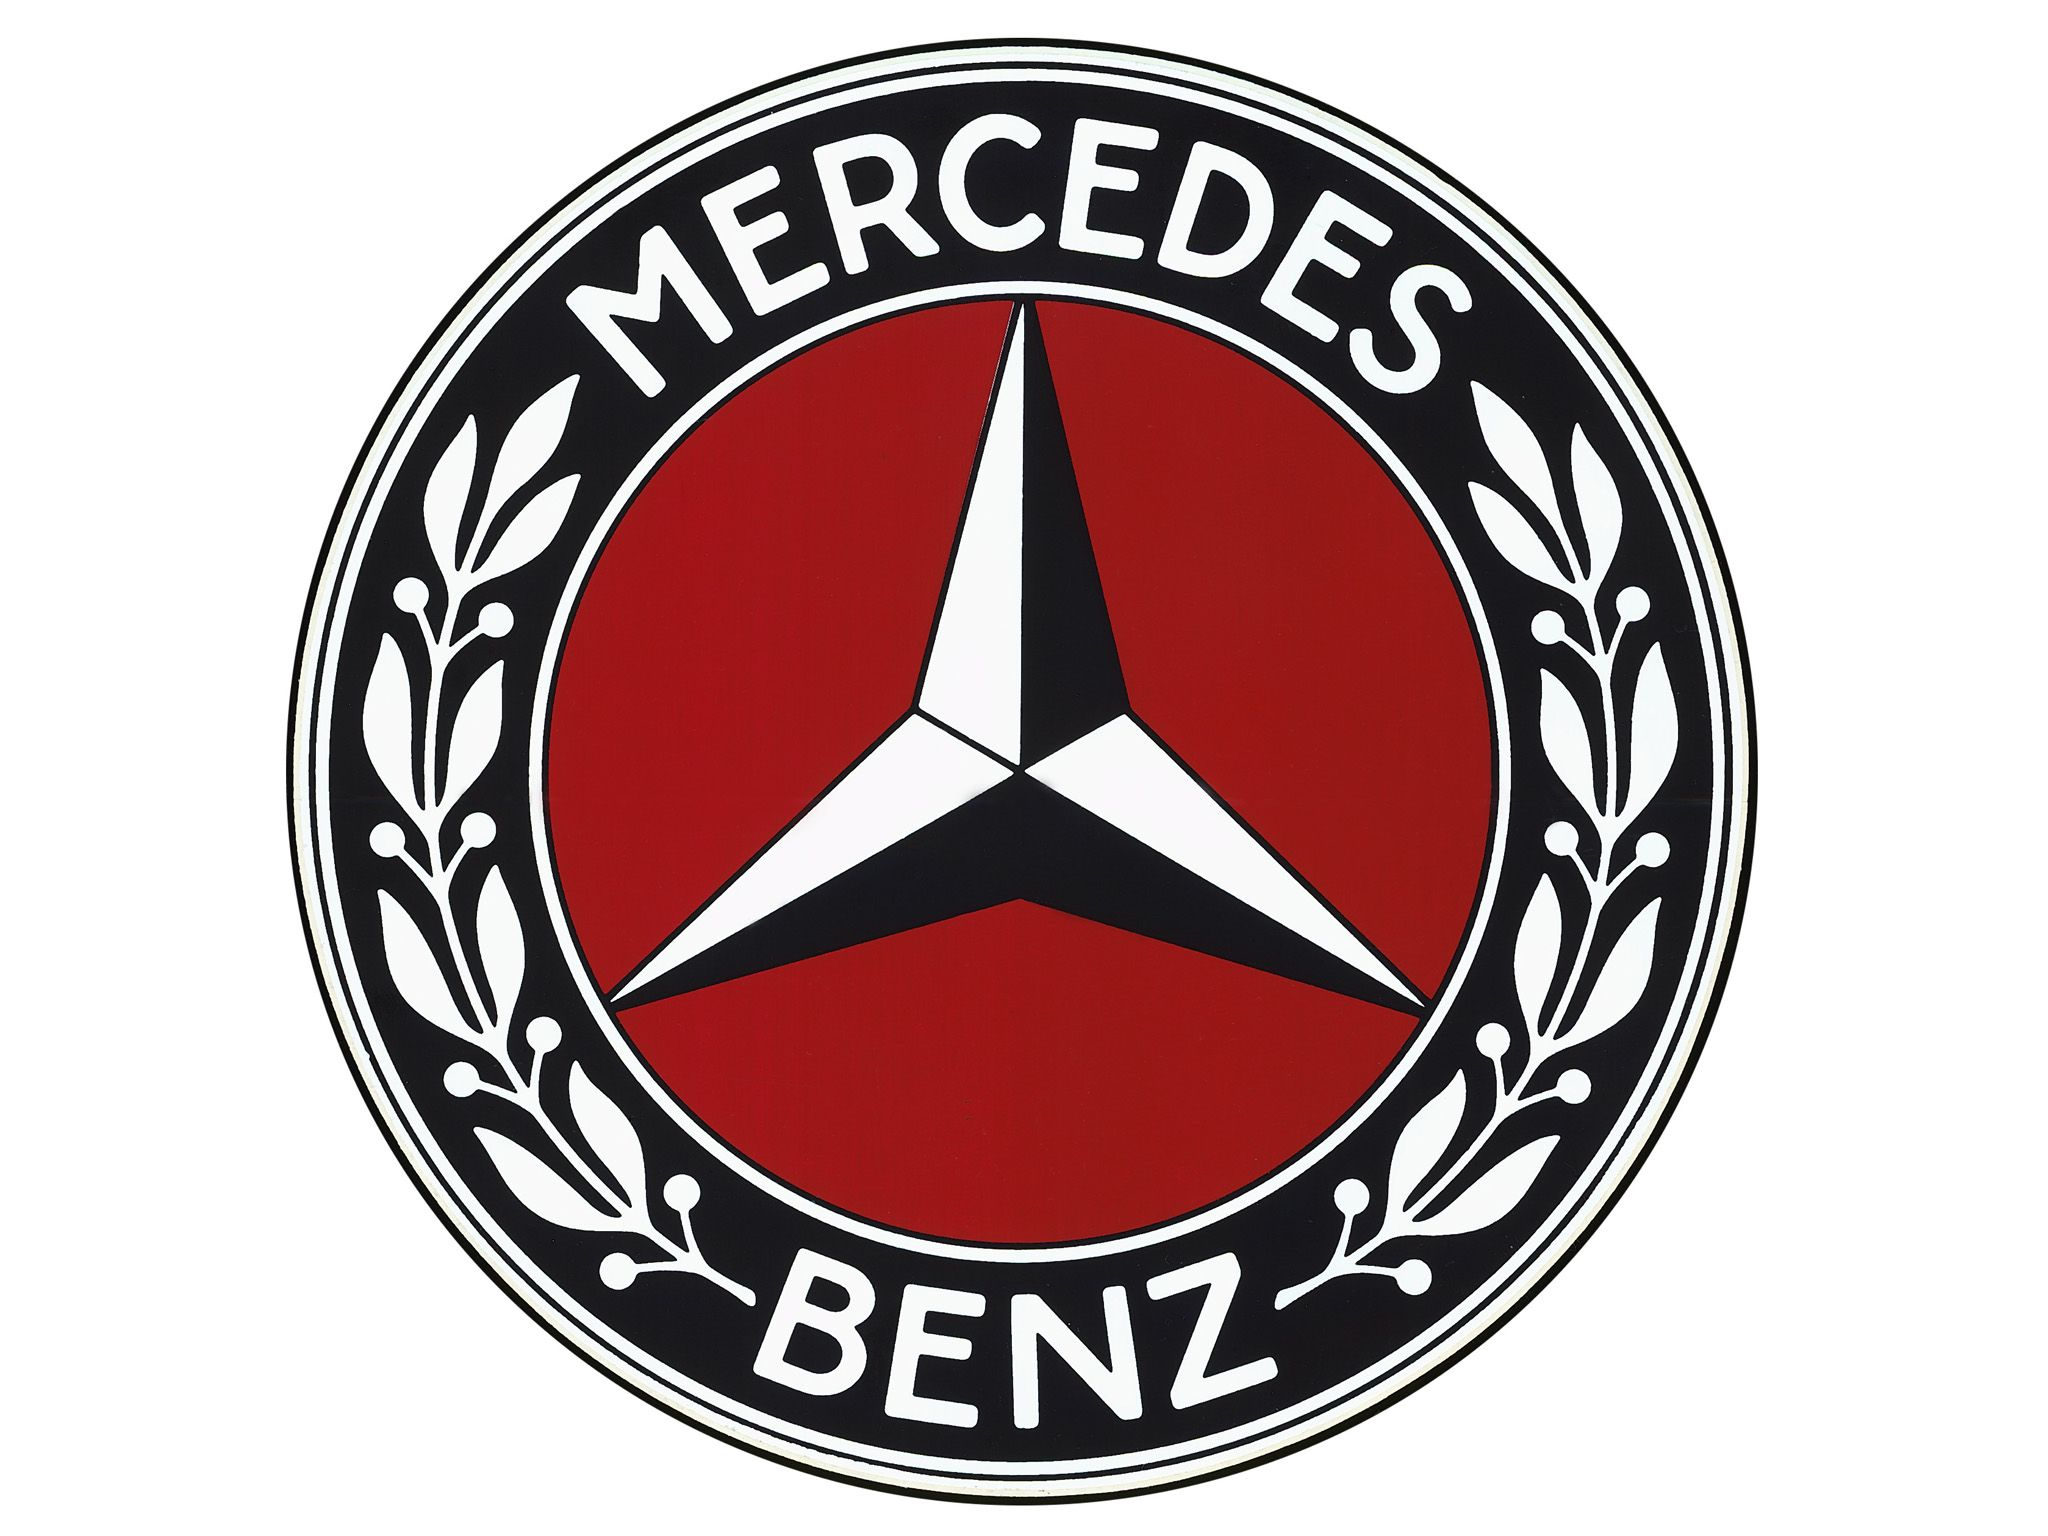 mercedes logo Поиск в Google Mercedes logo, Mercedes